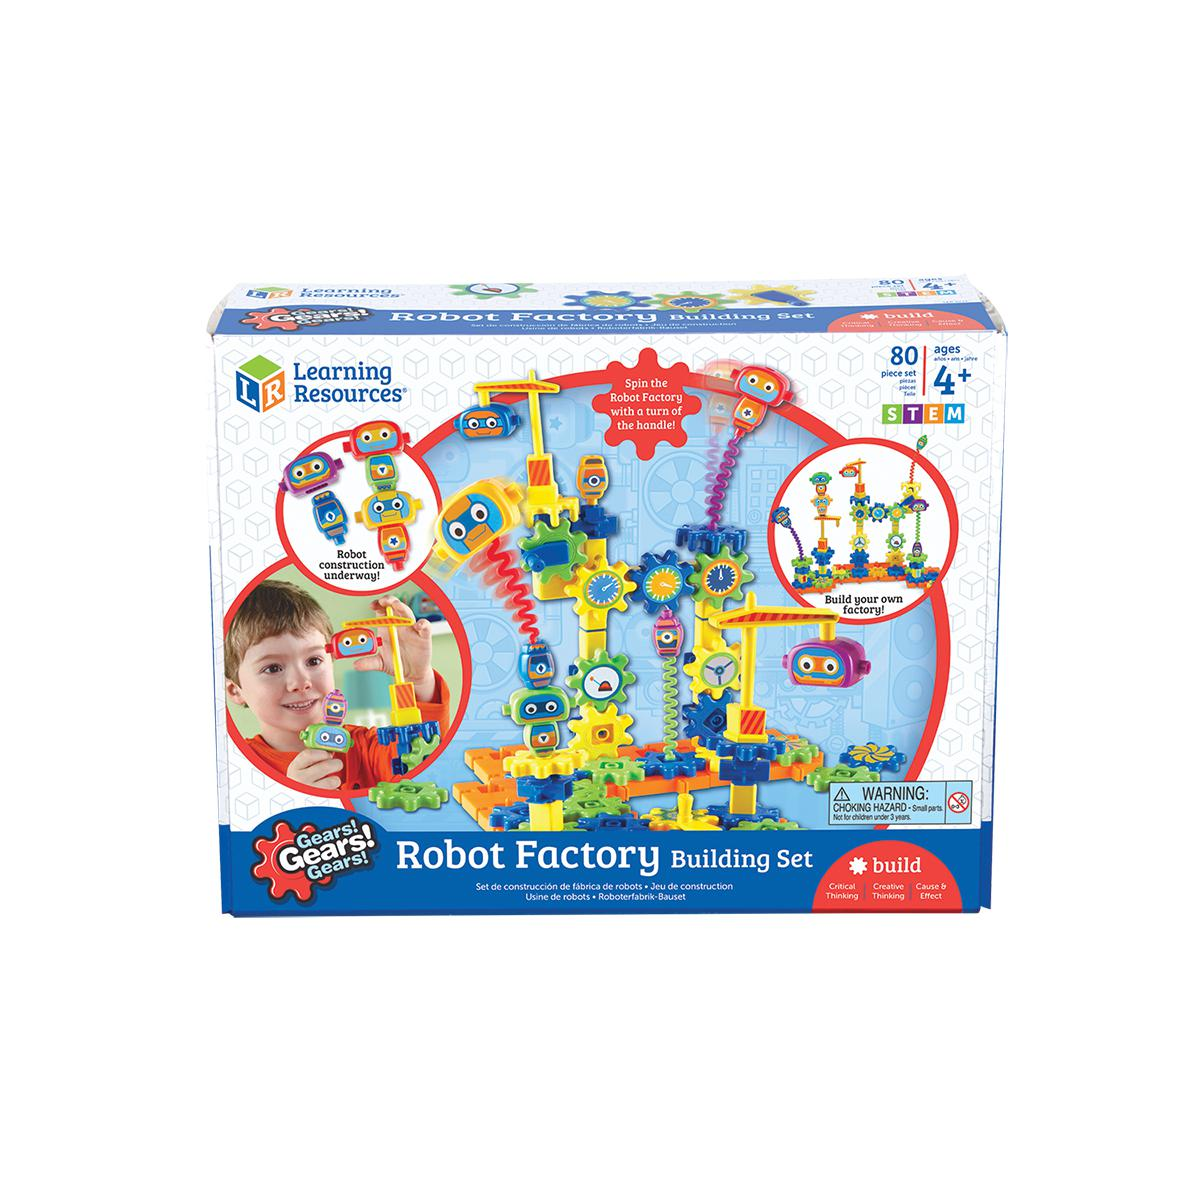 Gears! Gears! Gears!® Robot Factory Building Set